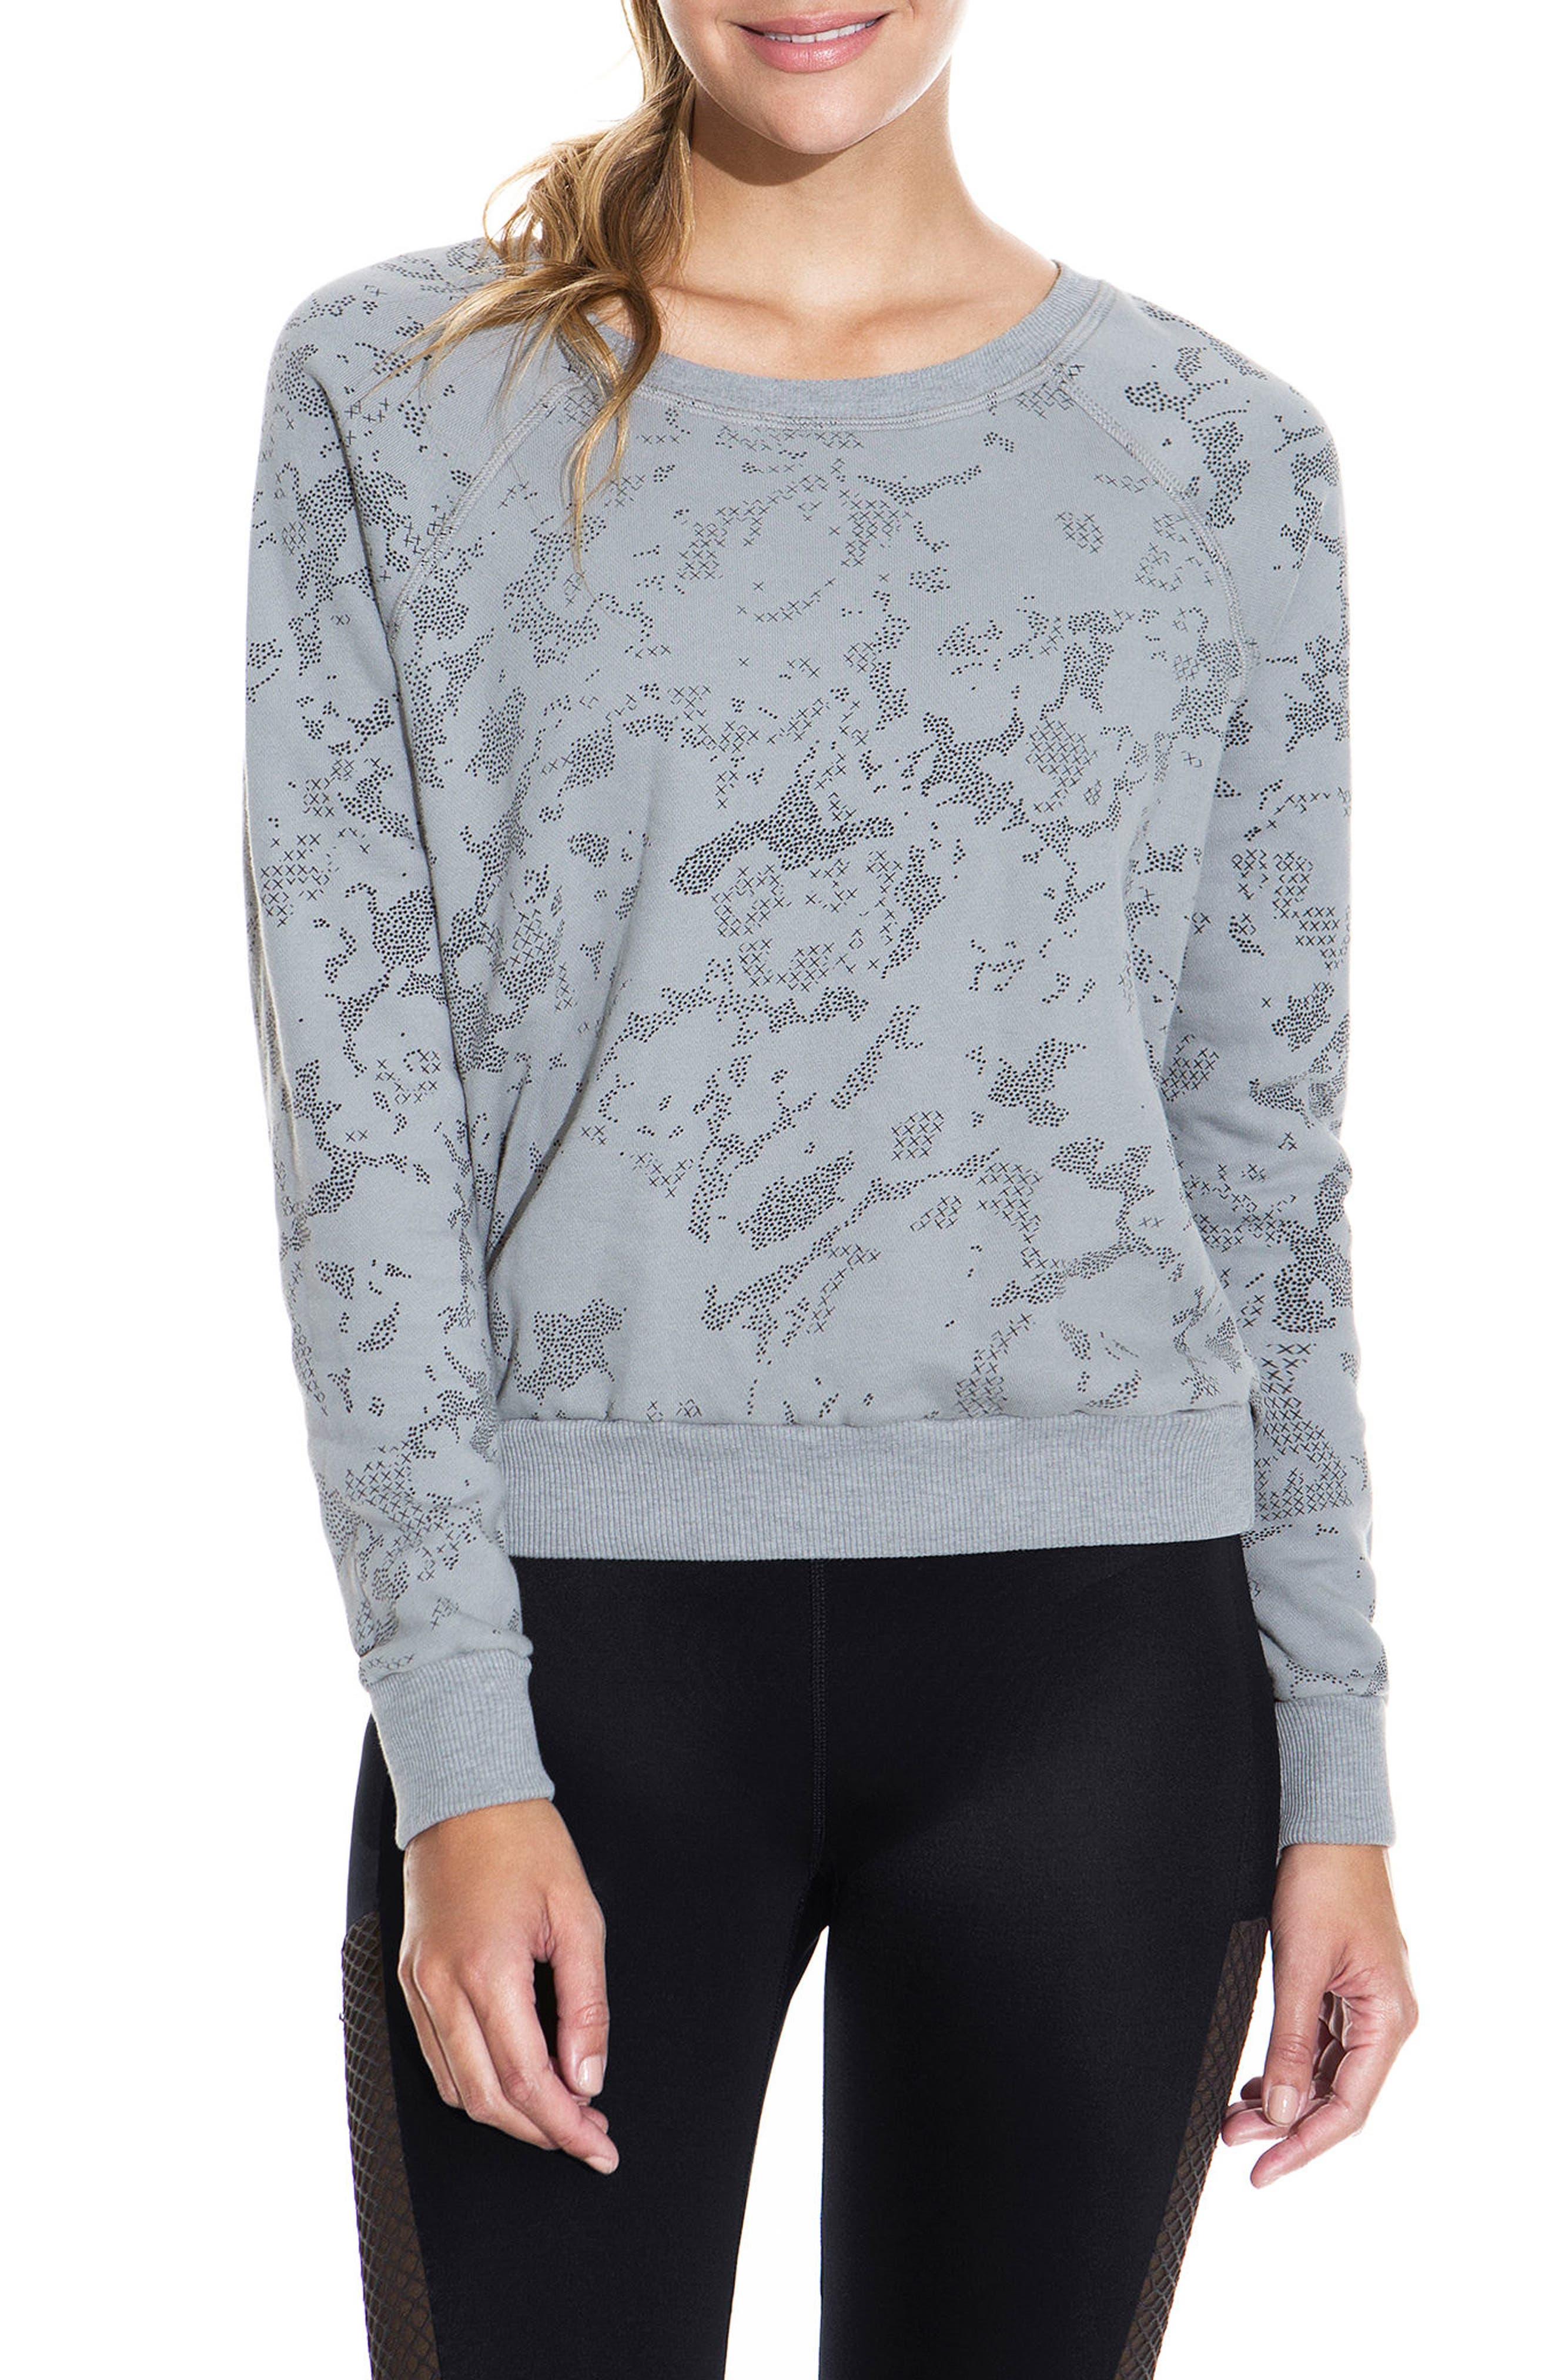 Sleek Camo Granite Sweatshirt,                             Main thumbnail 1, color,                             030